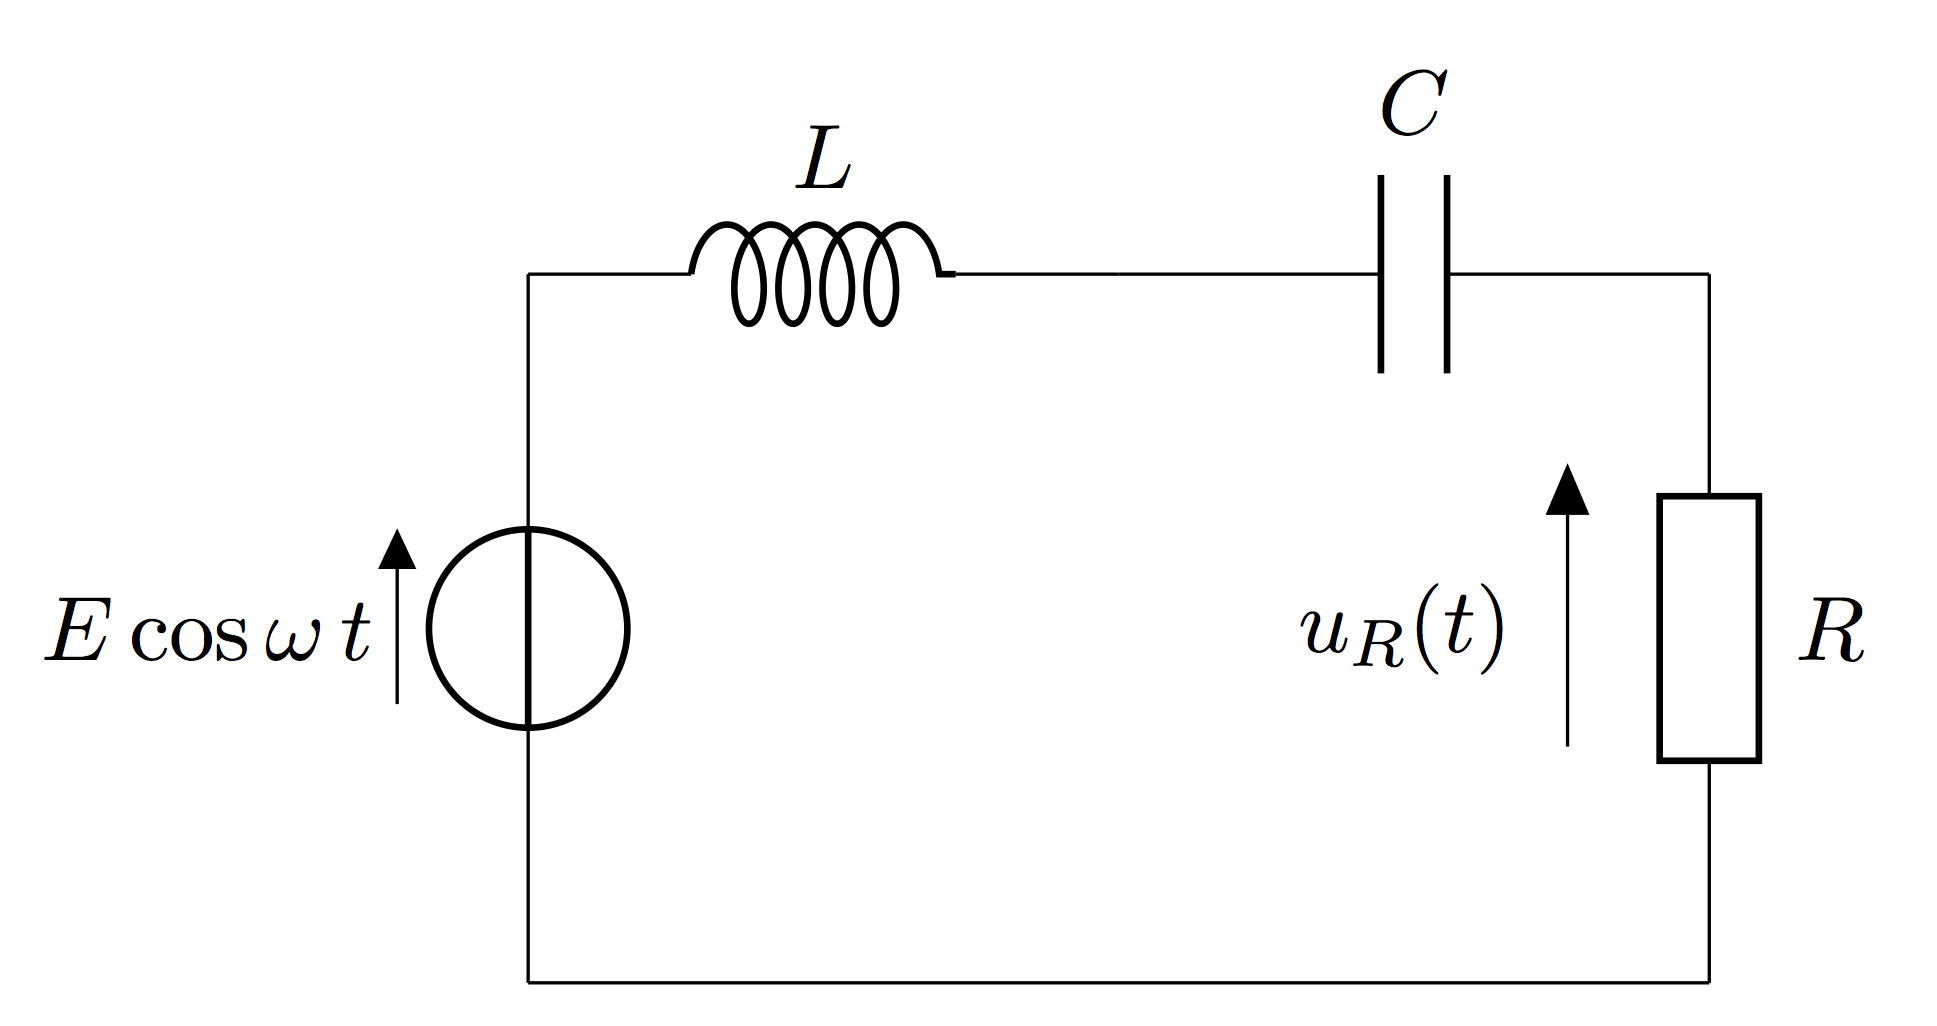 physagreg   cours d u0026 39  u00e9lectrocin u00e9tique   cours 5   r u00e9sonances du circuit rlc s u00e9rie